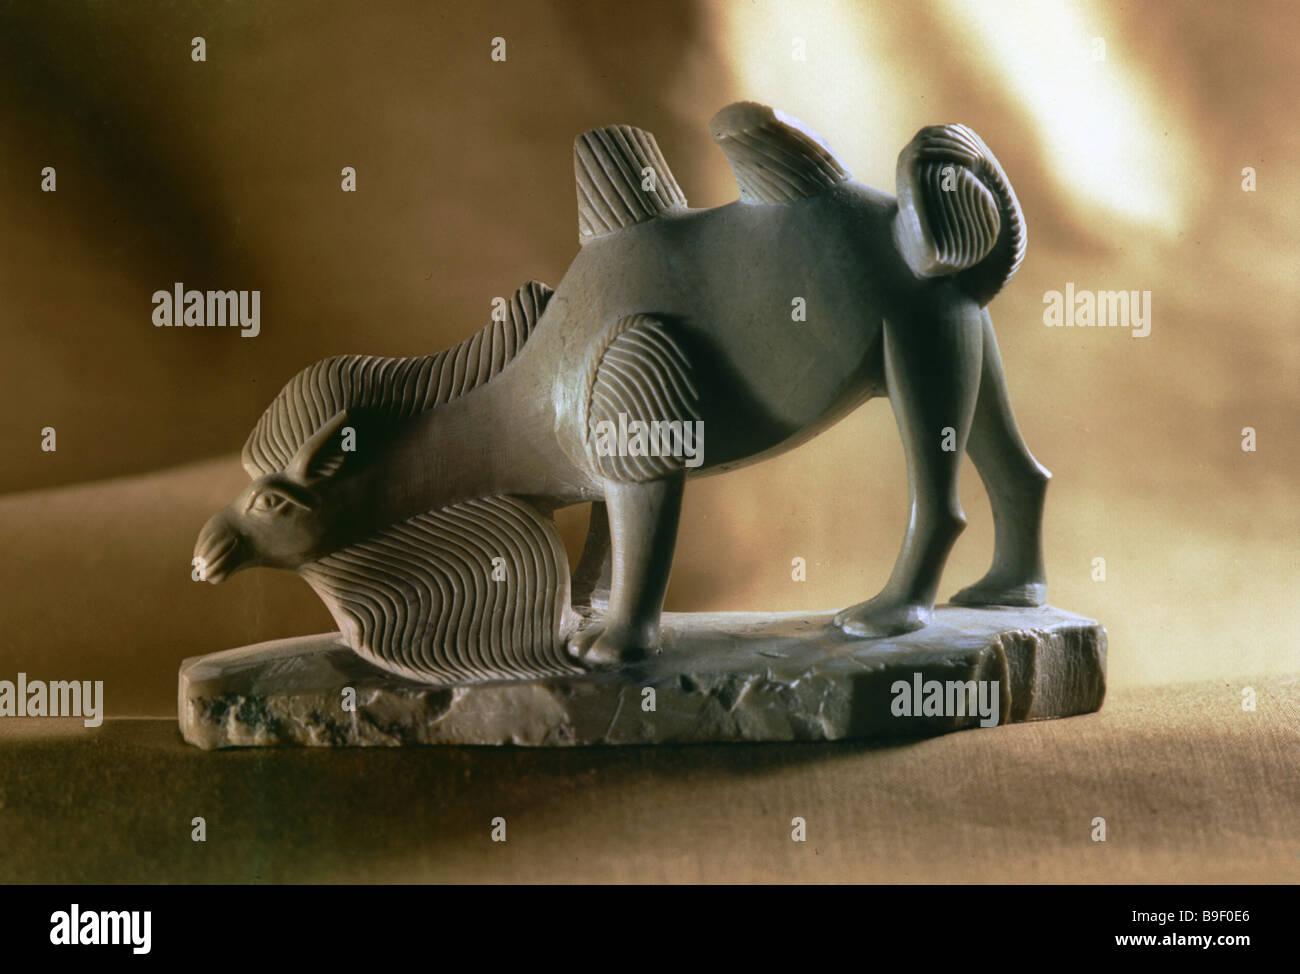 Camel a statuette by sculptor Khertek Toibukhaa - Stock Image